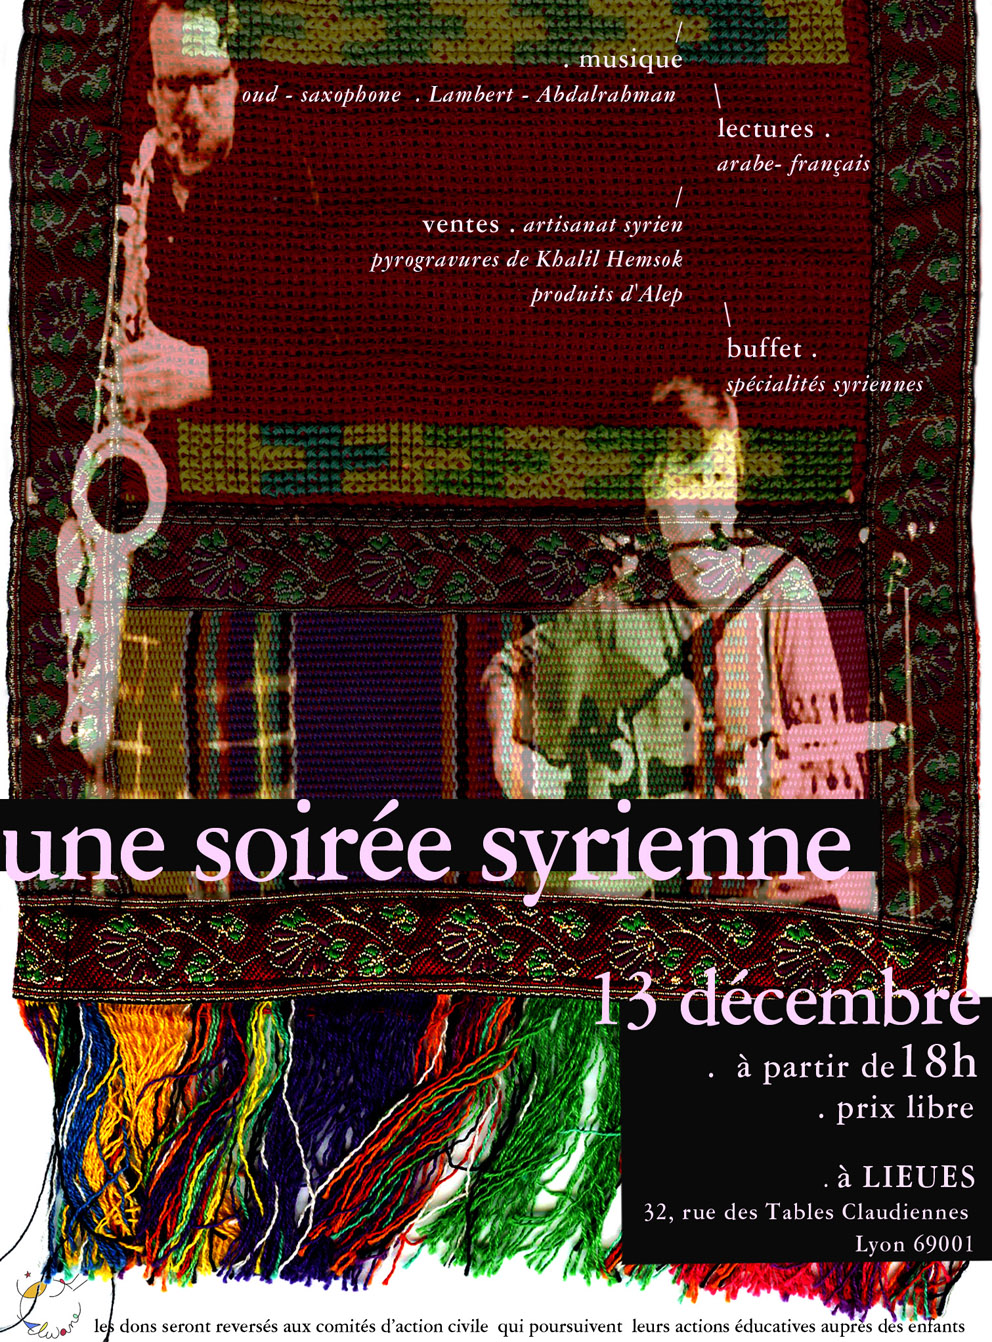 SOIREE SYRIENNE A L'ESPACE LIEUES  Duo Lambert Abd Alrahman oud et saxophone